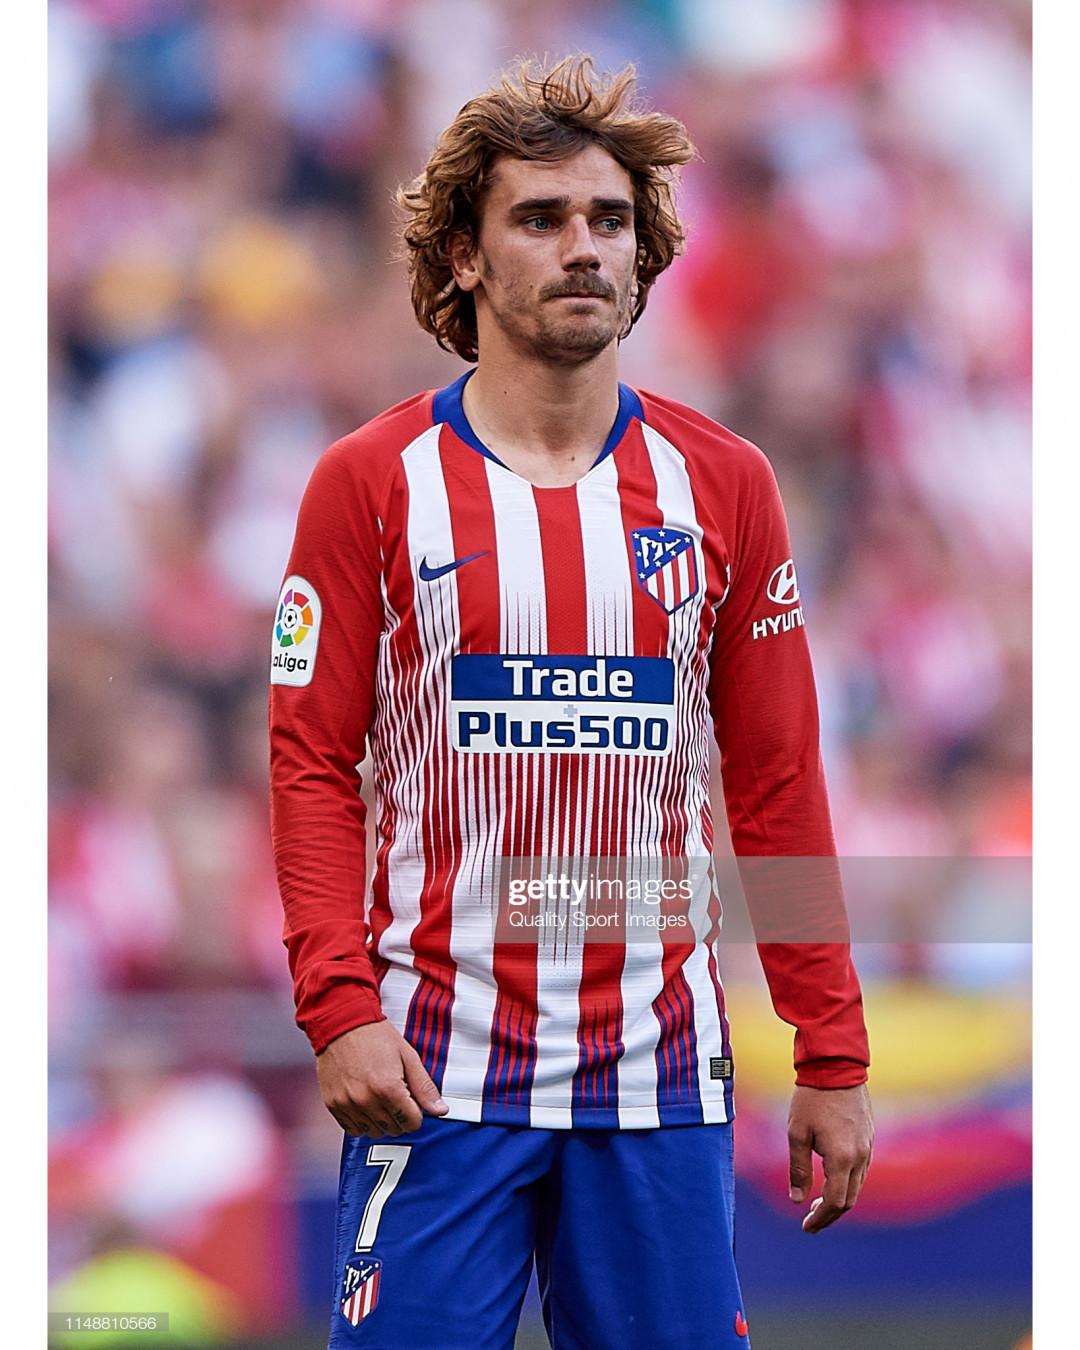 Antoine Griezmann จะออกจากAtlético de Madrid พร้อมเซ็นสัญญากับแมนเชสเตอร์ยูไนเต็ด …